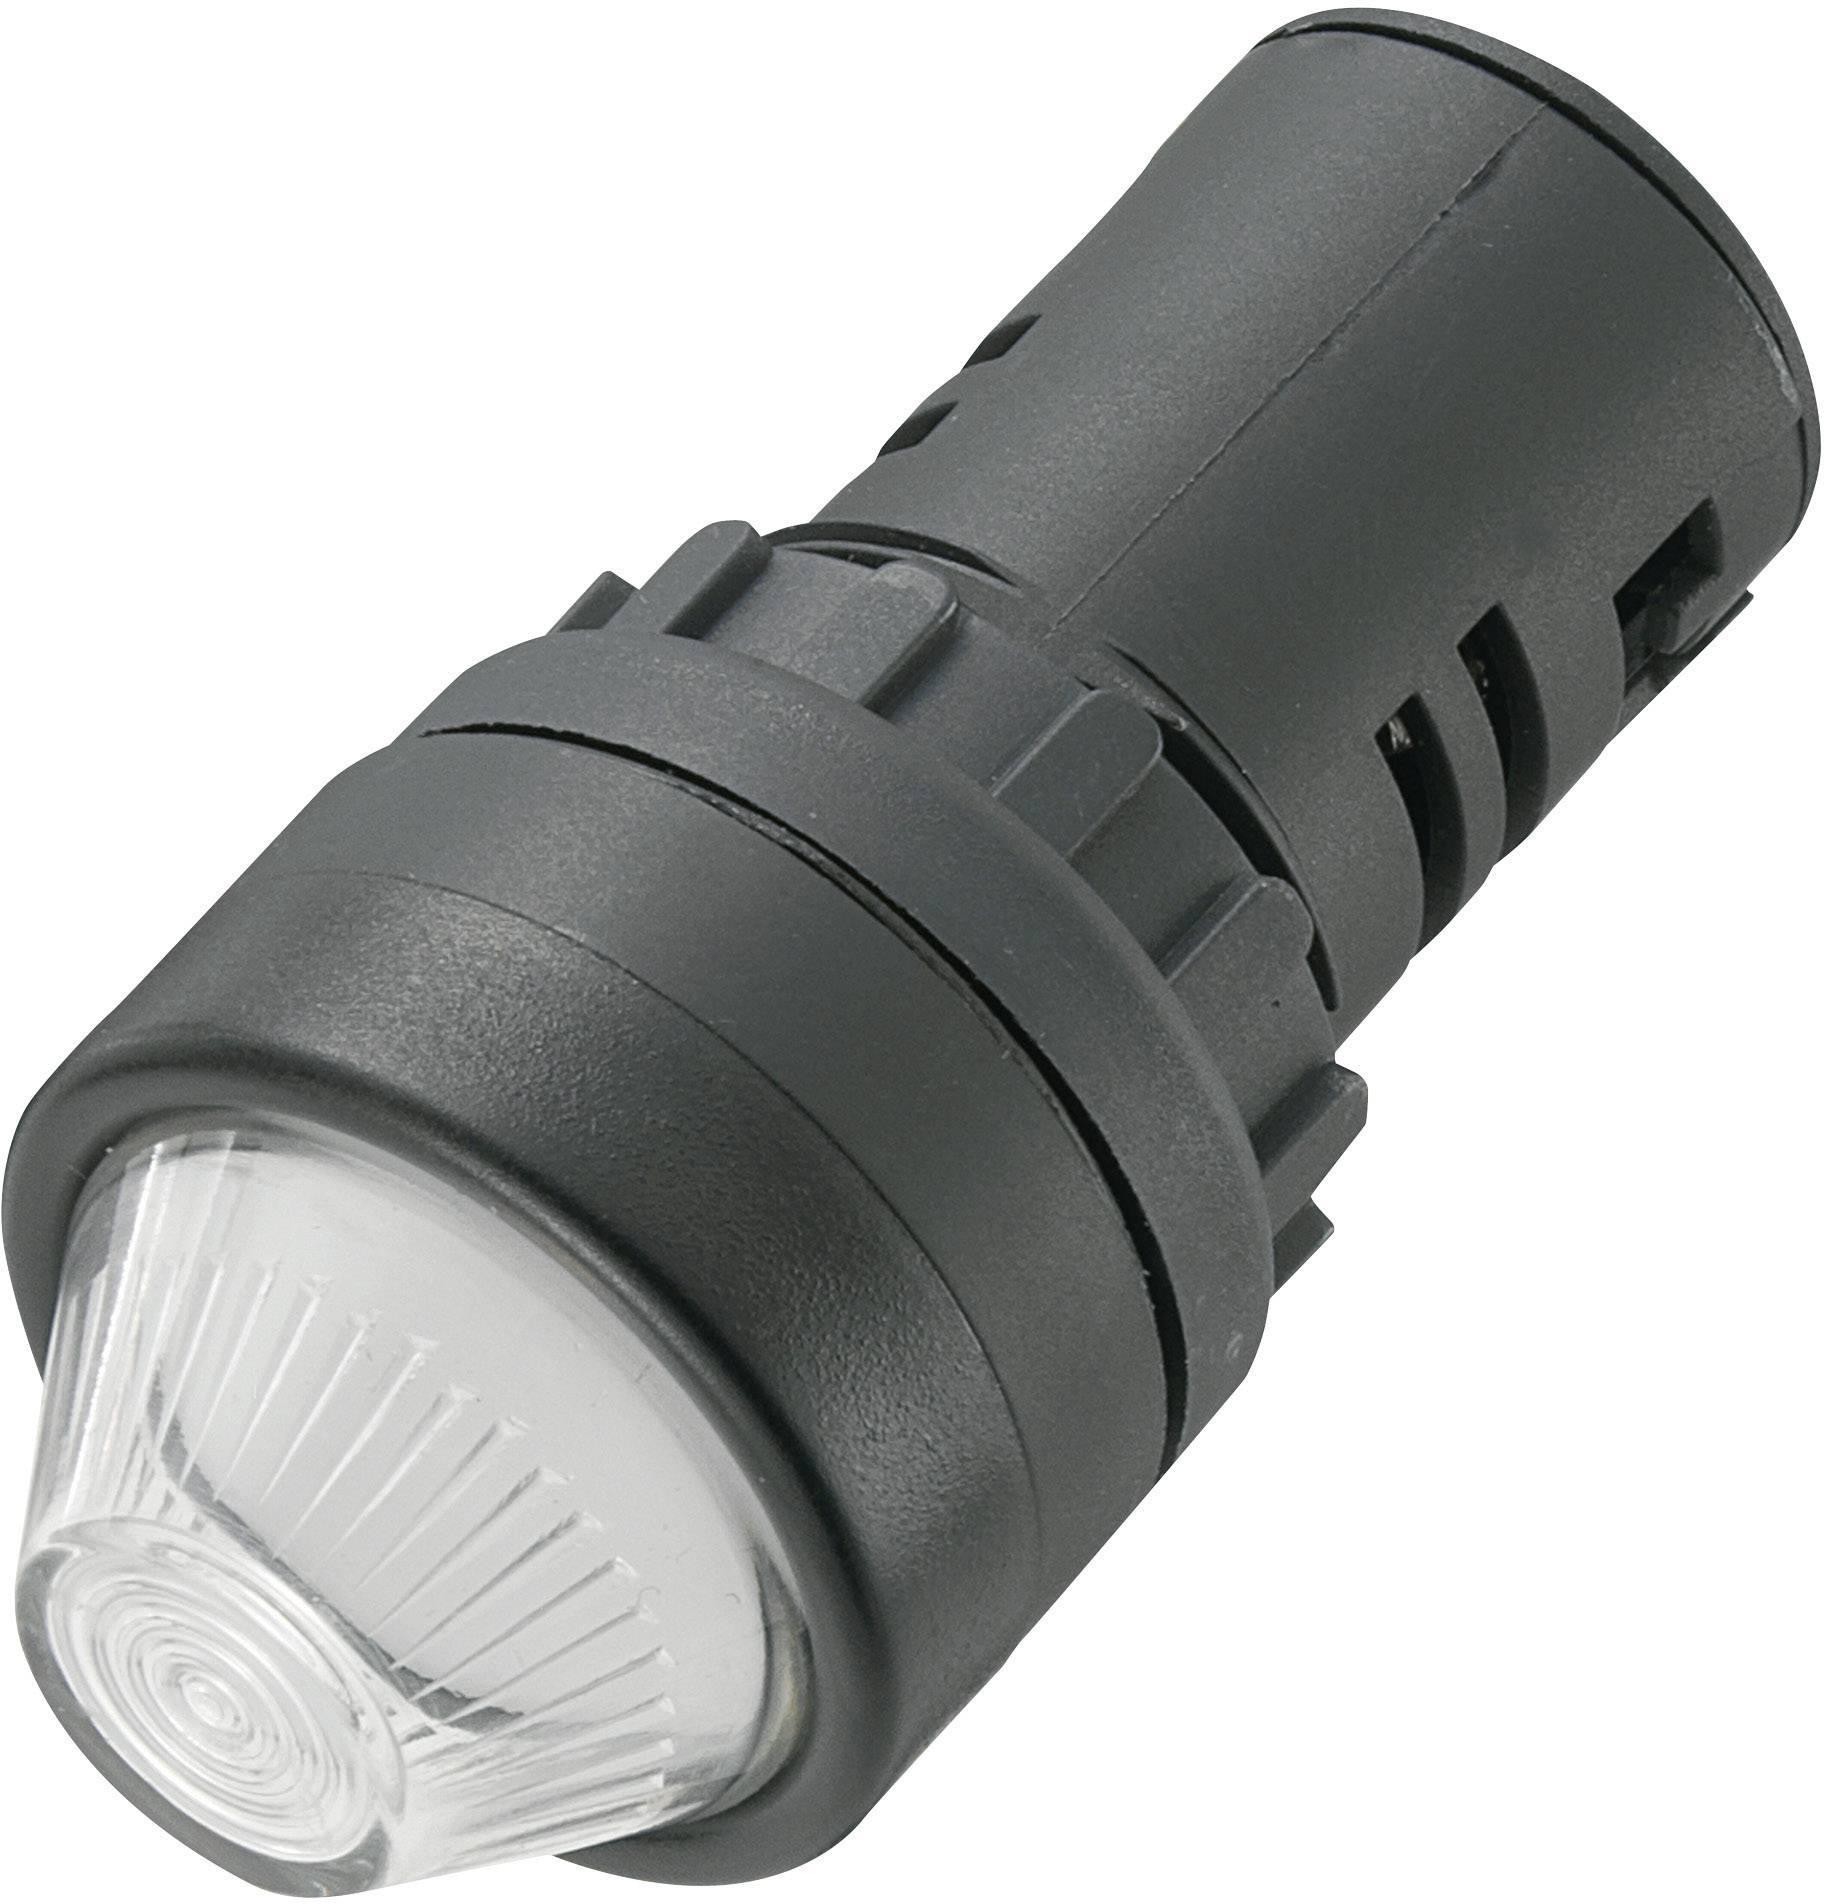 LED signálka AD16-22HS/230V/W, LED signálka, 230 V/AC, bílá